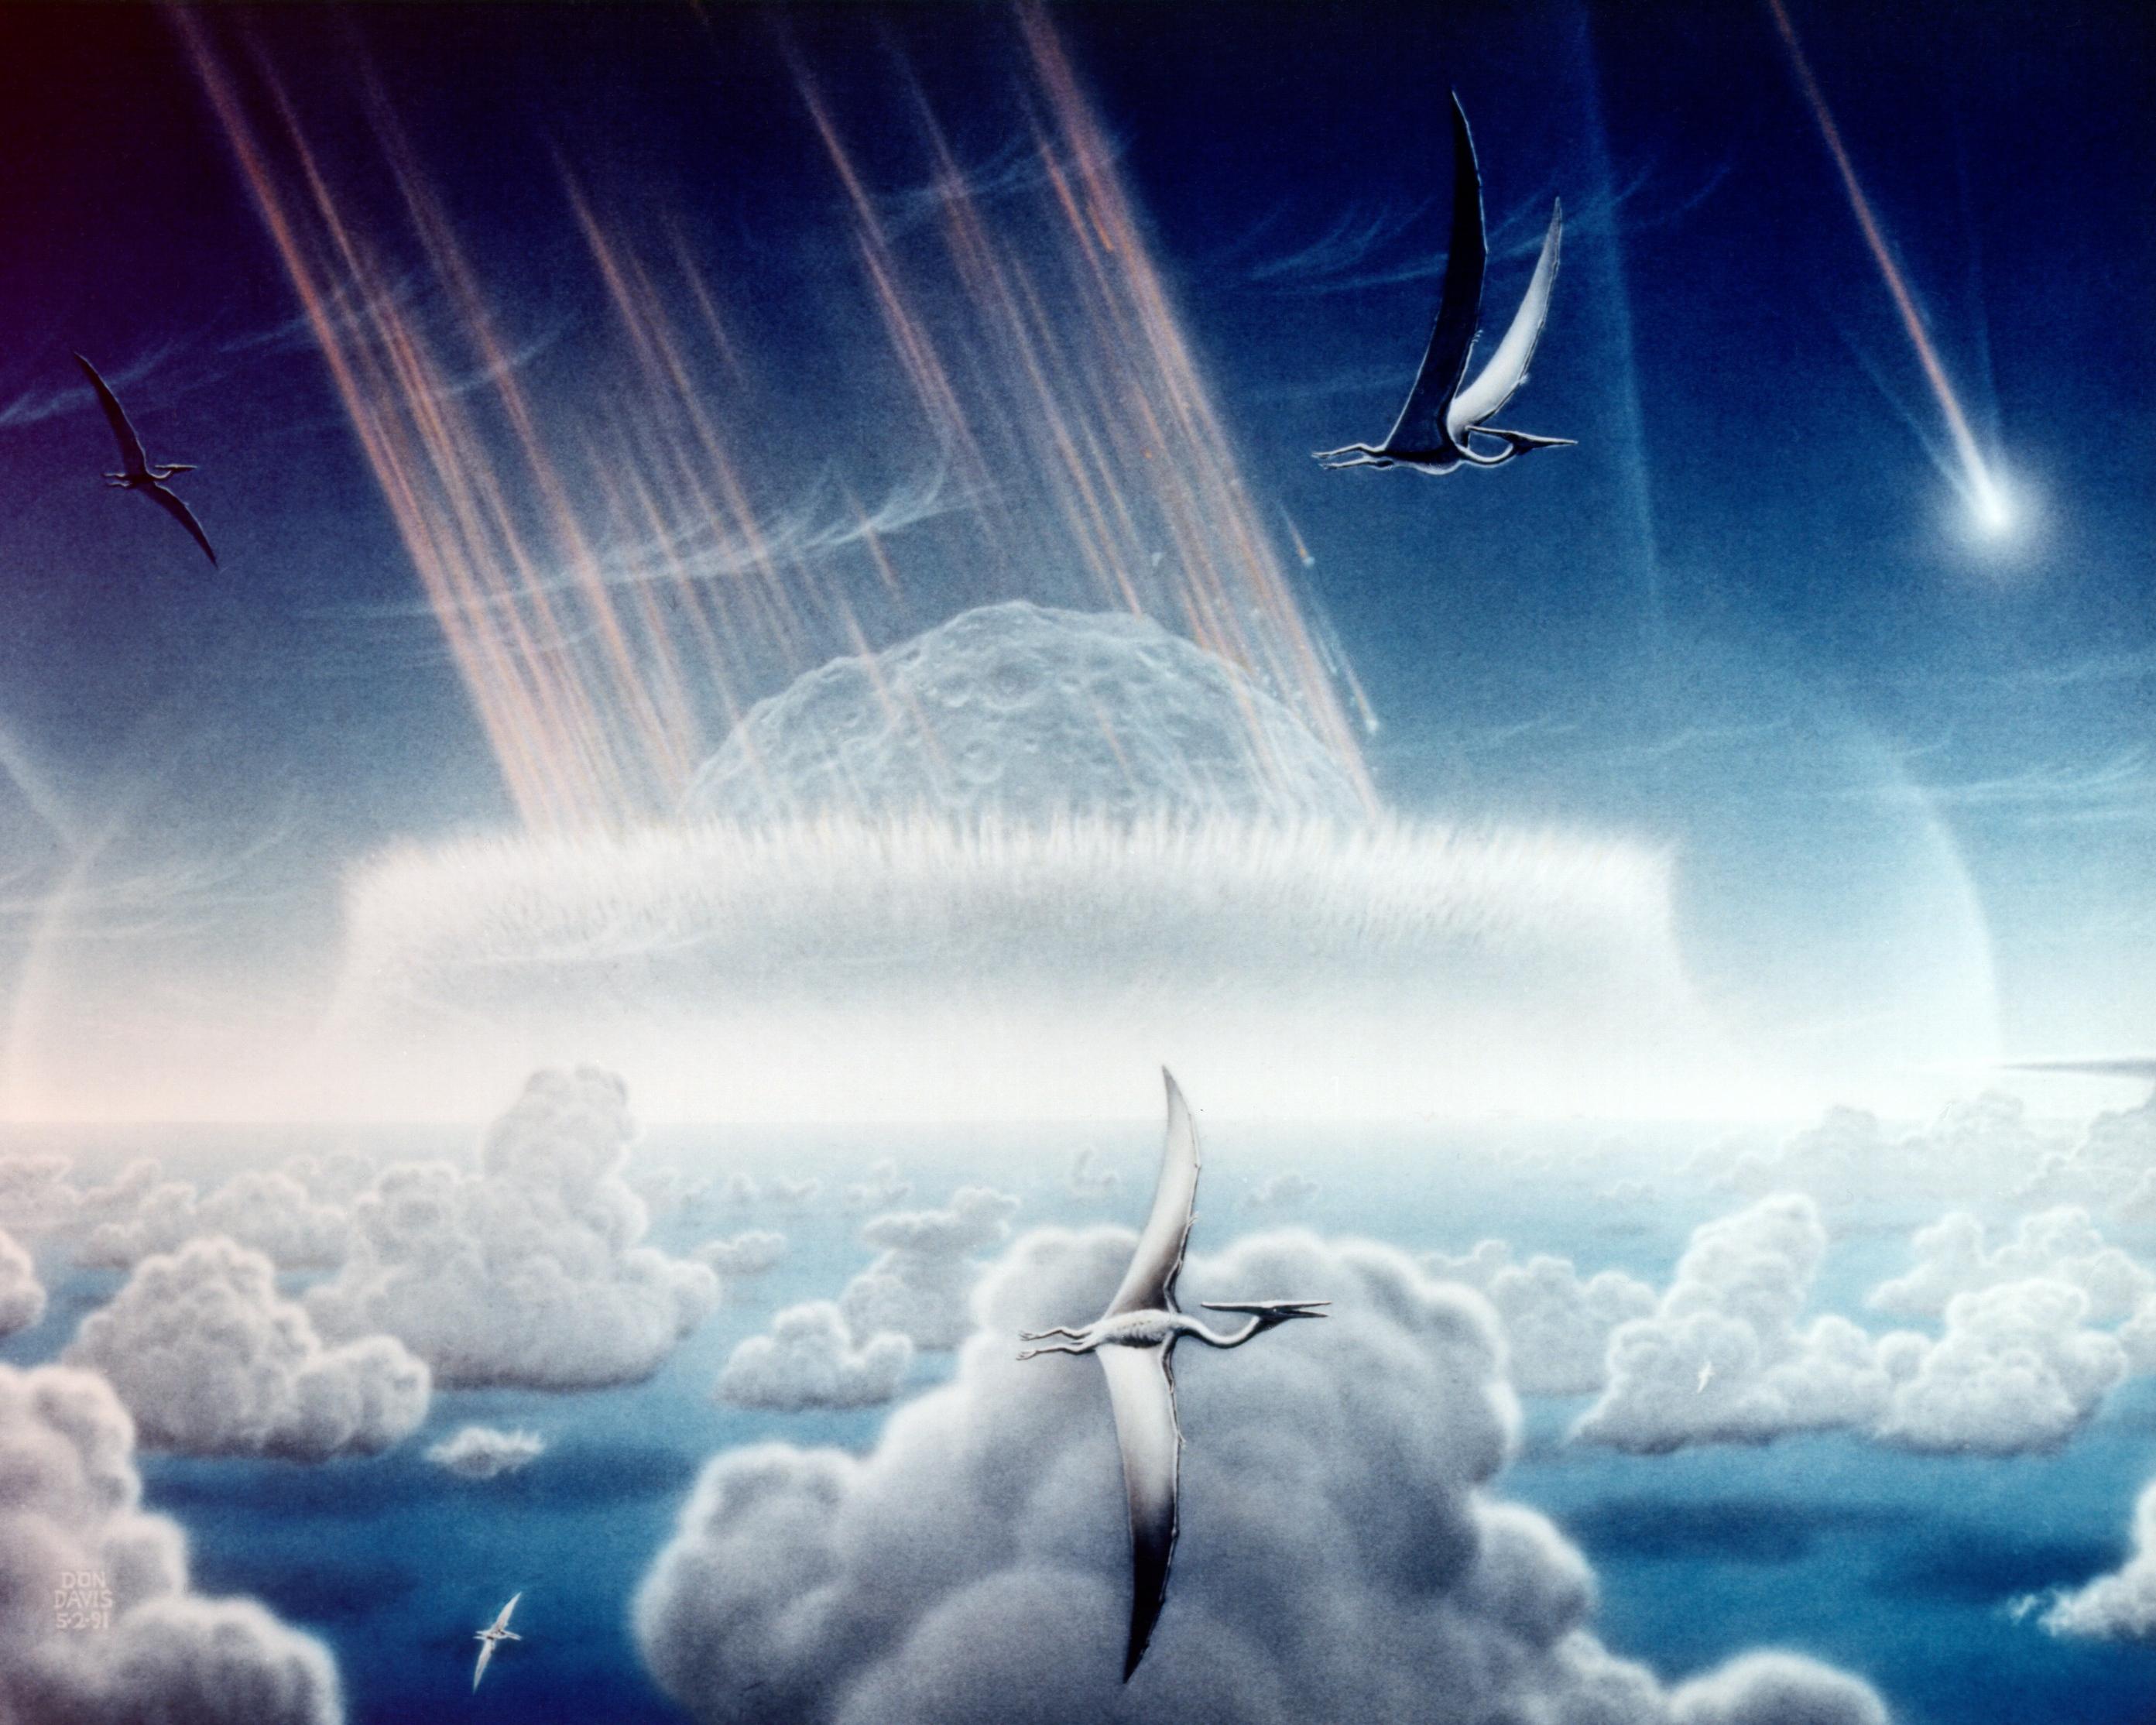 Peaceful nuclear explosion - Wikipedia